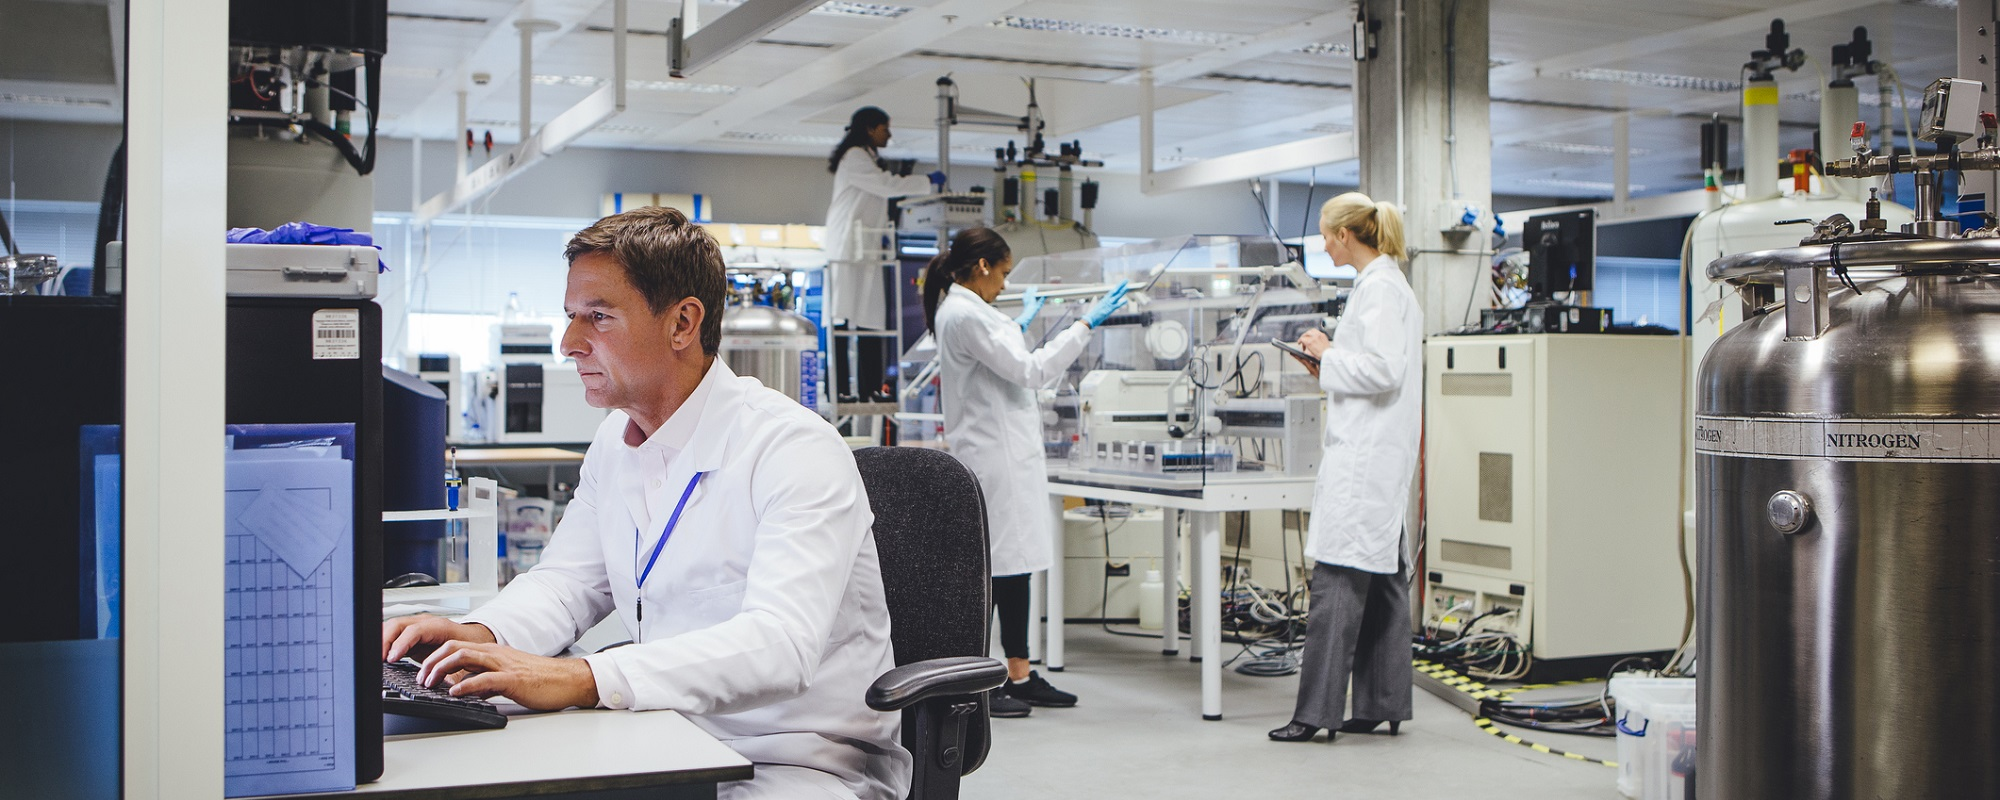 Mass Spectrometry Technology and Product Development Snapshots